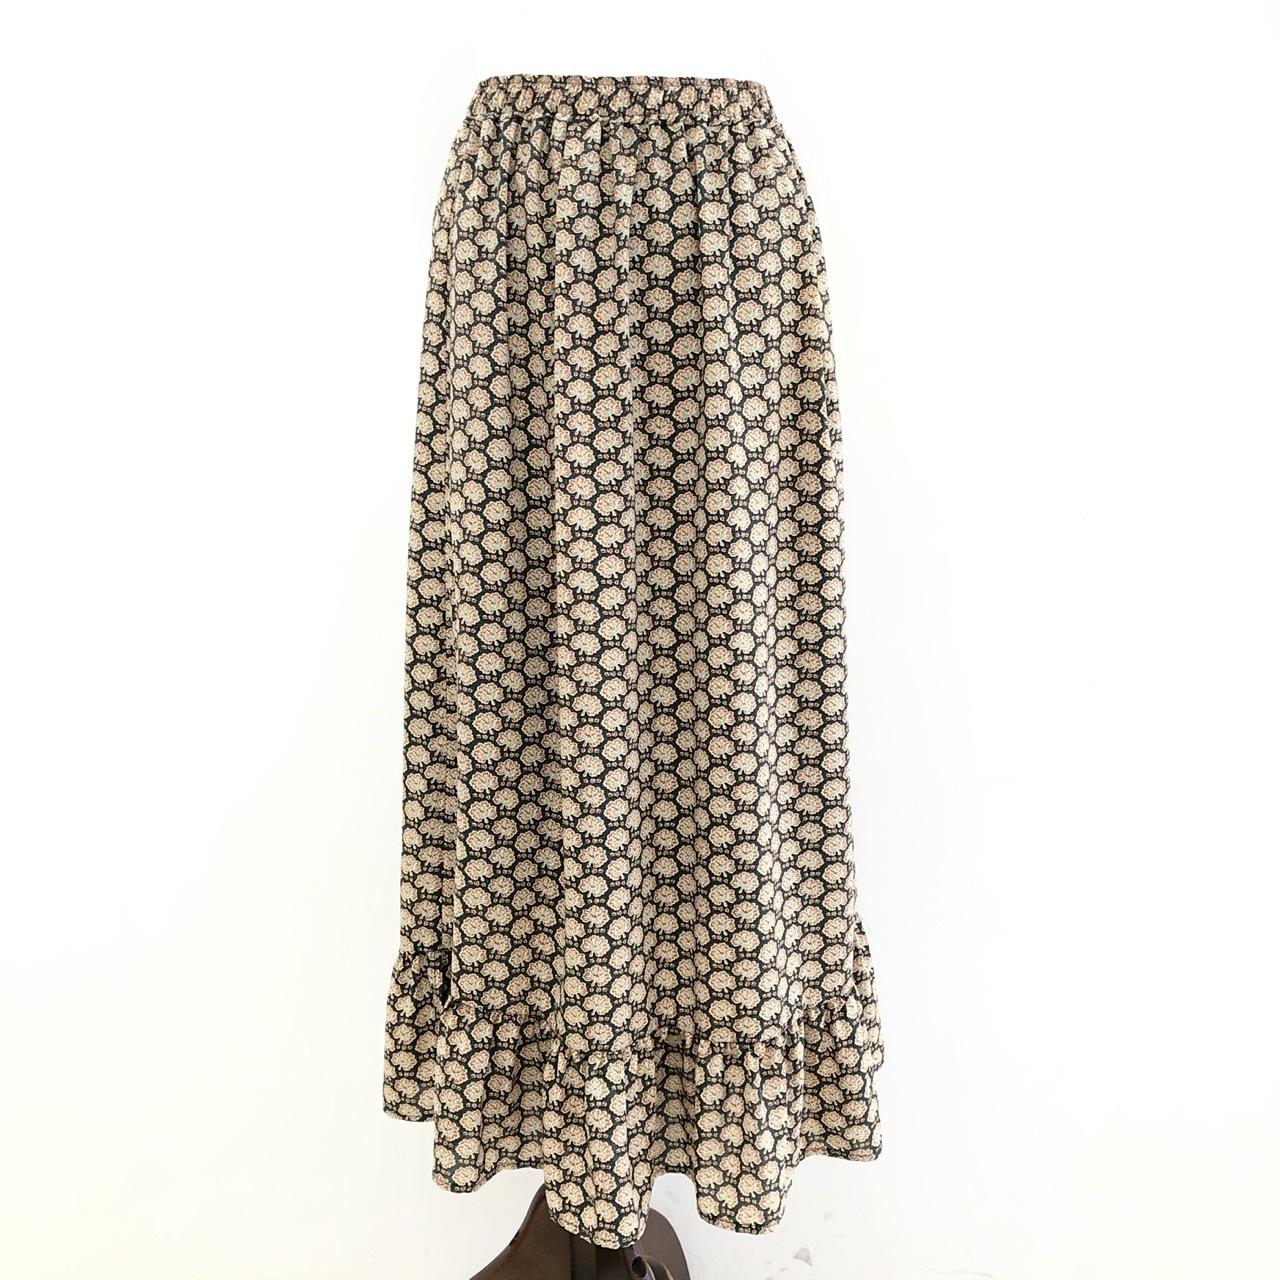 【 CHIGNONSTAR 】- 2601-238 - flower lowティアードスカート